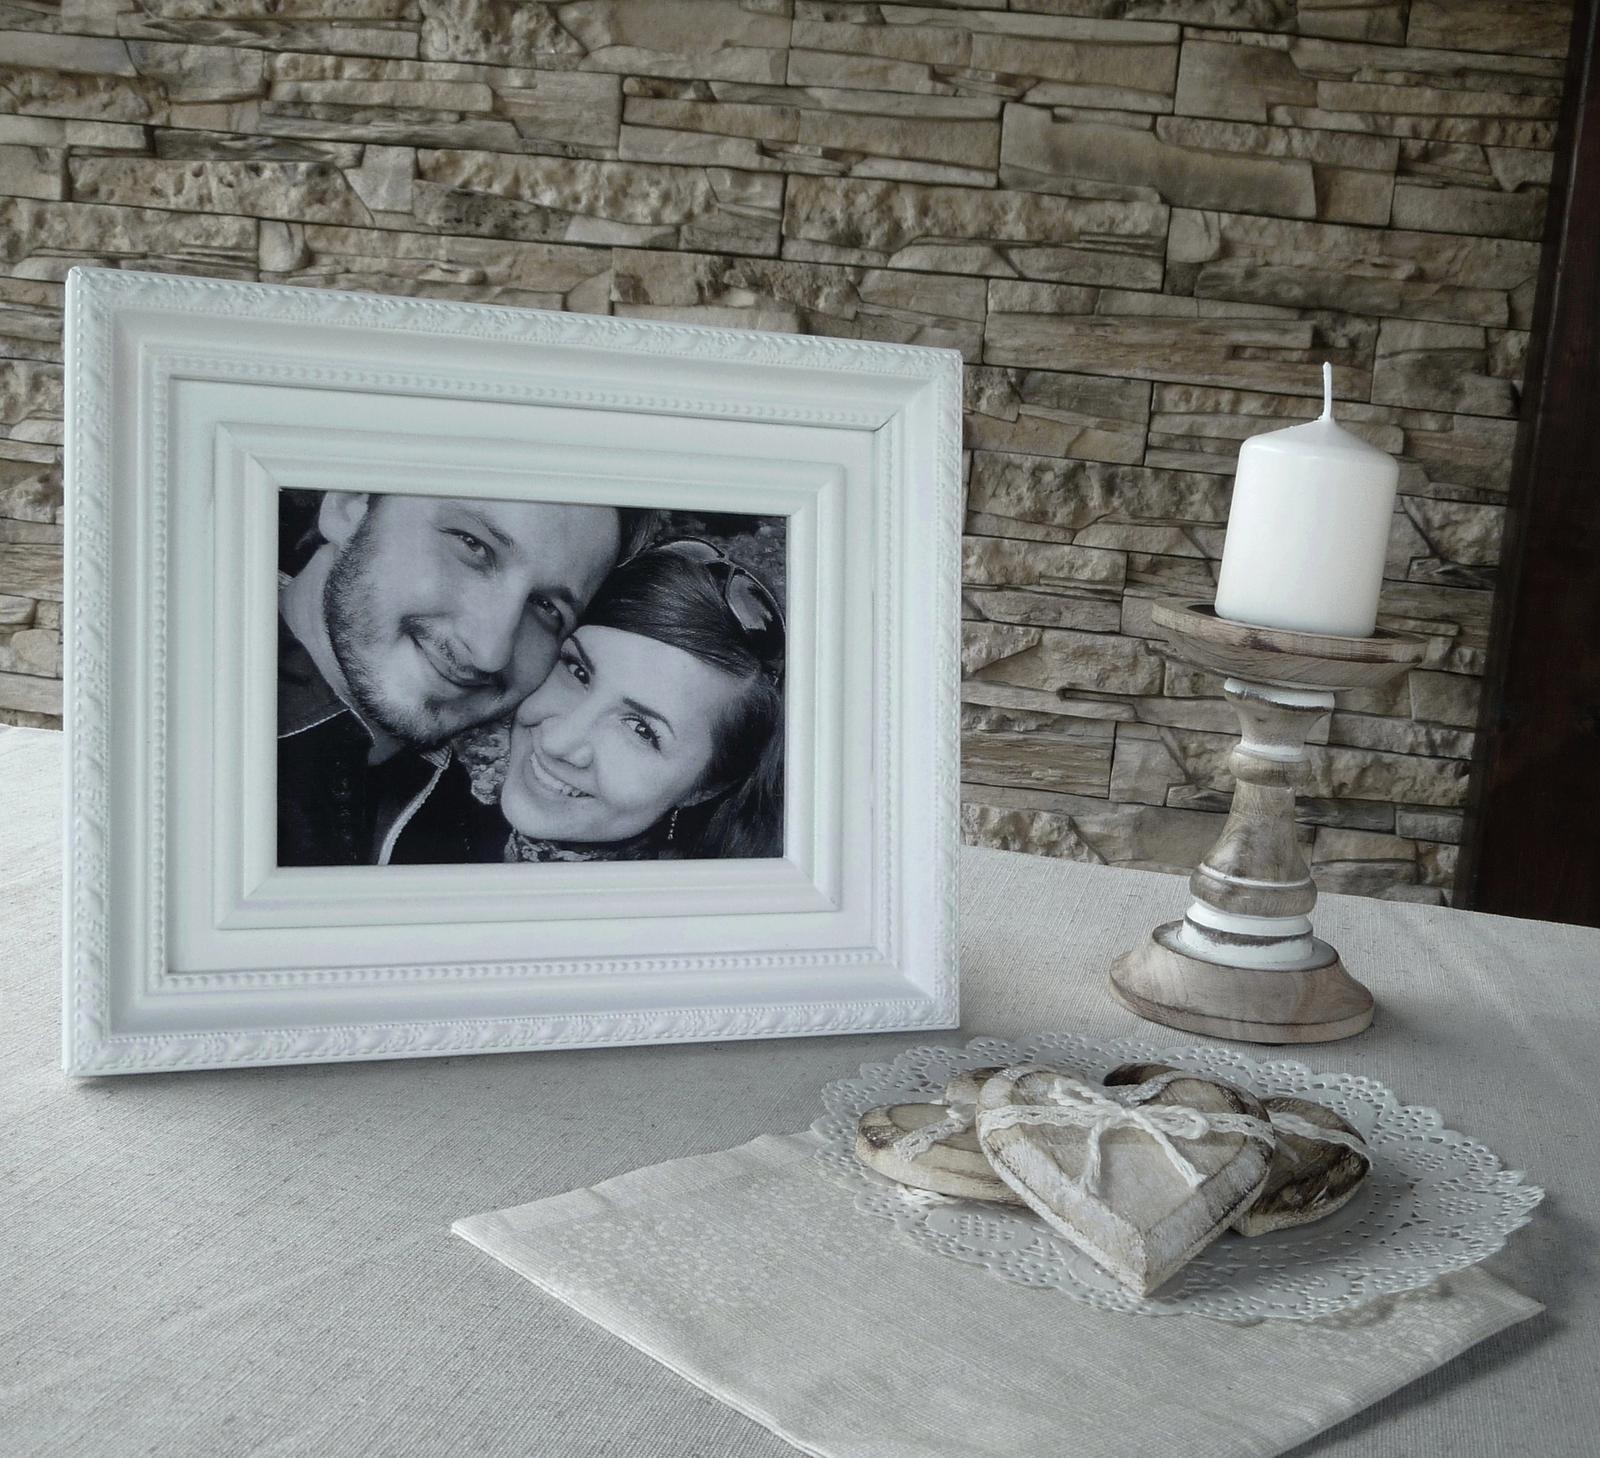 Naša romantic-rustic svadba ♥ - č. 2 :)